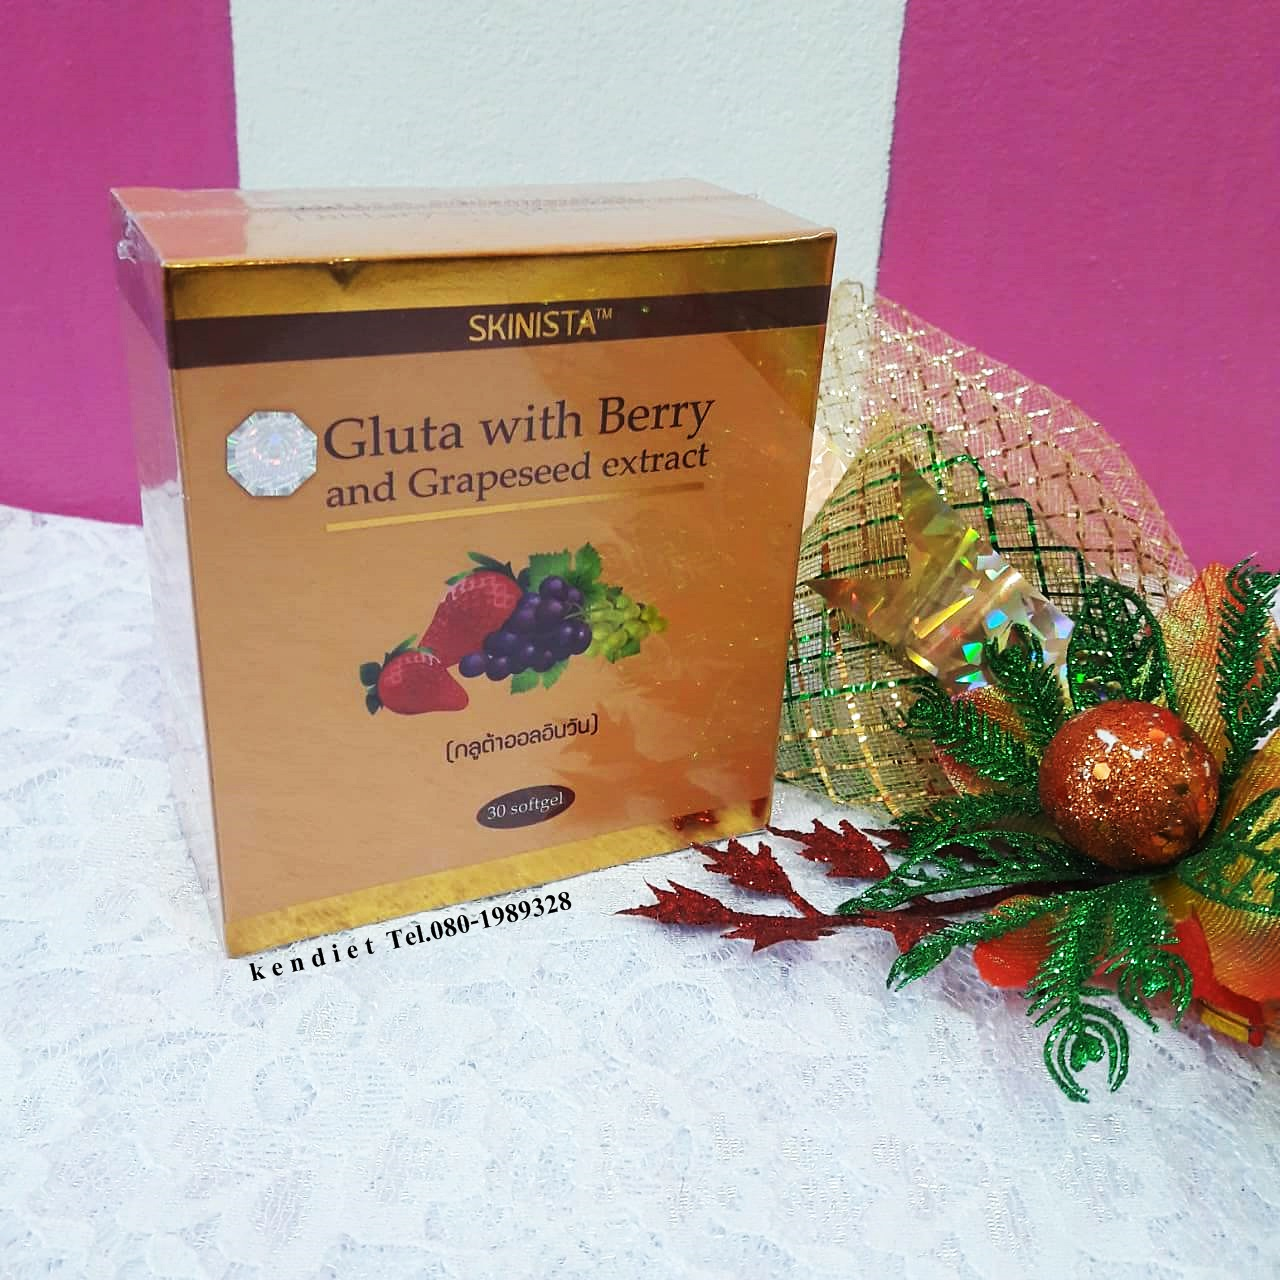 Skinista Gluta All in One กลูต้าออลอินวัน 30 เม็ด 390 บาท